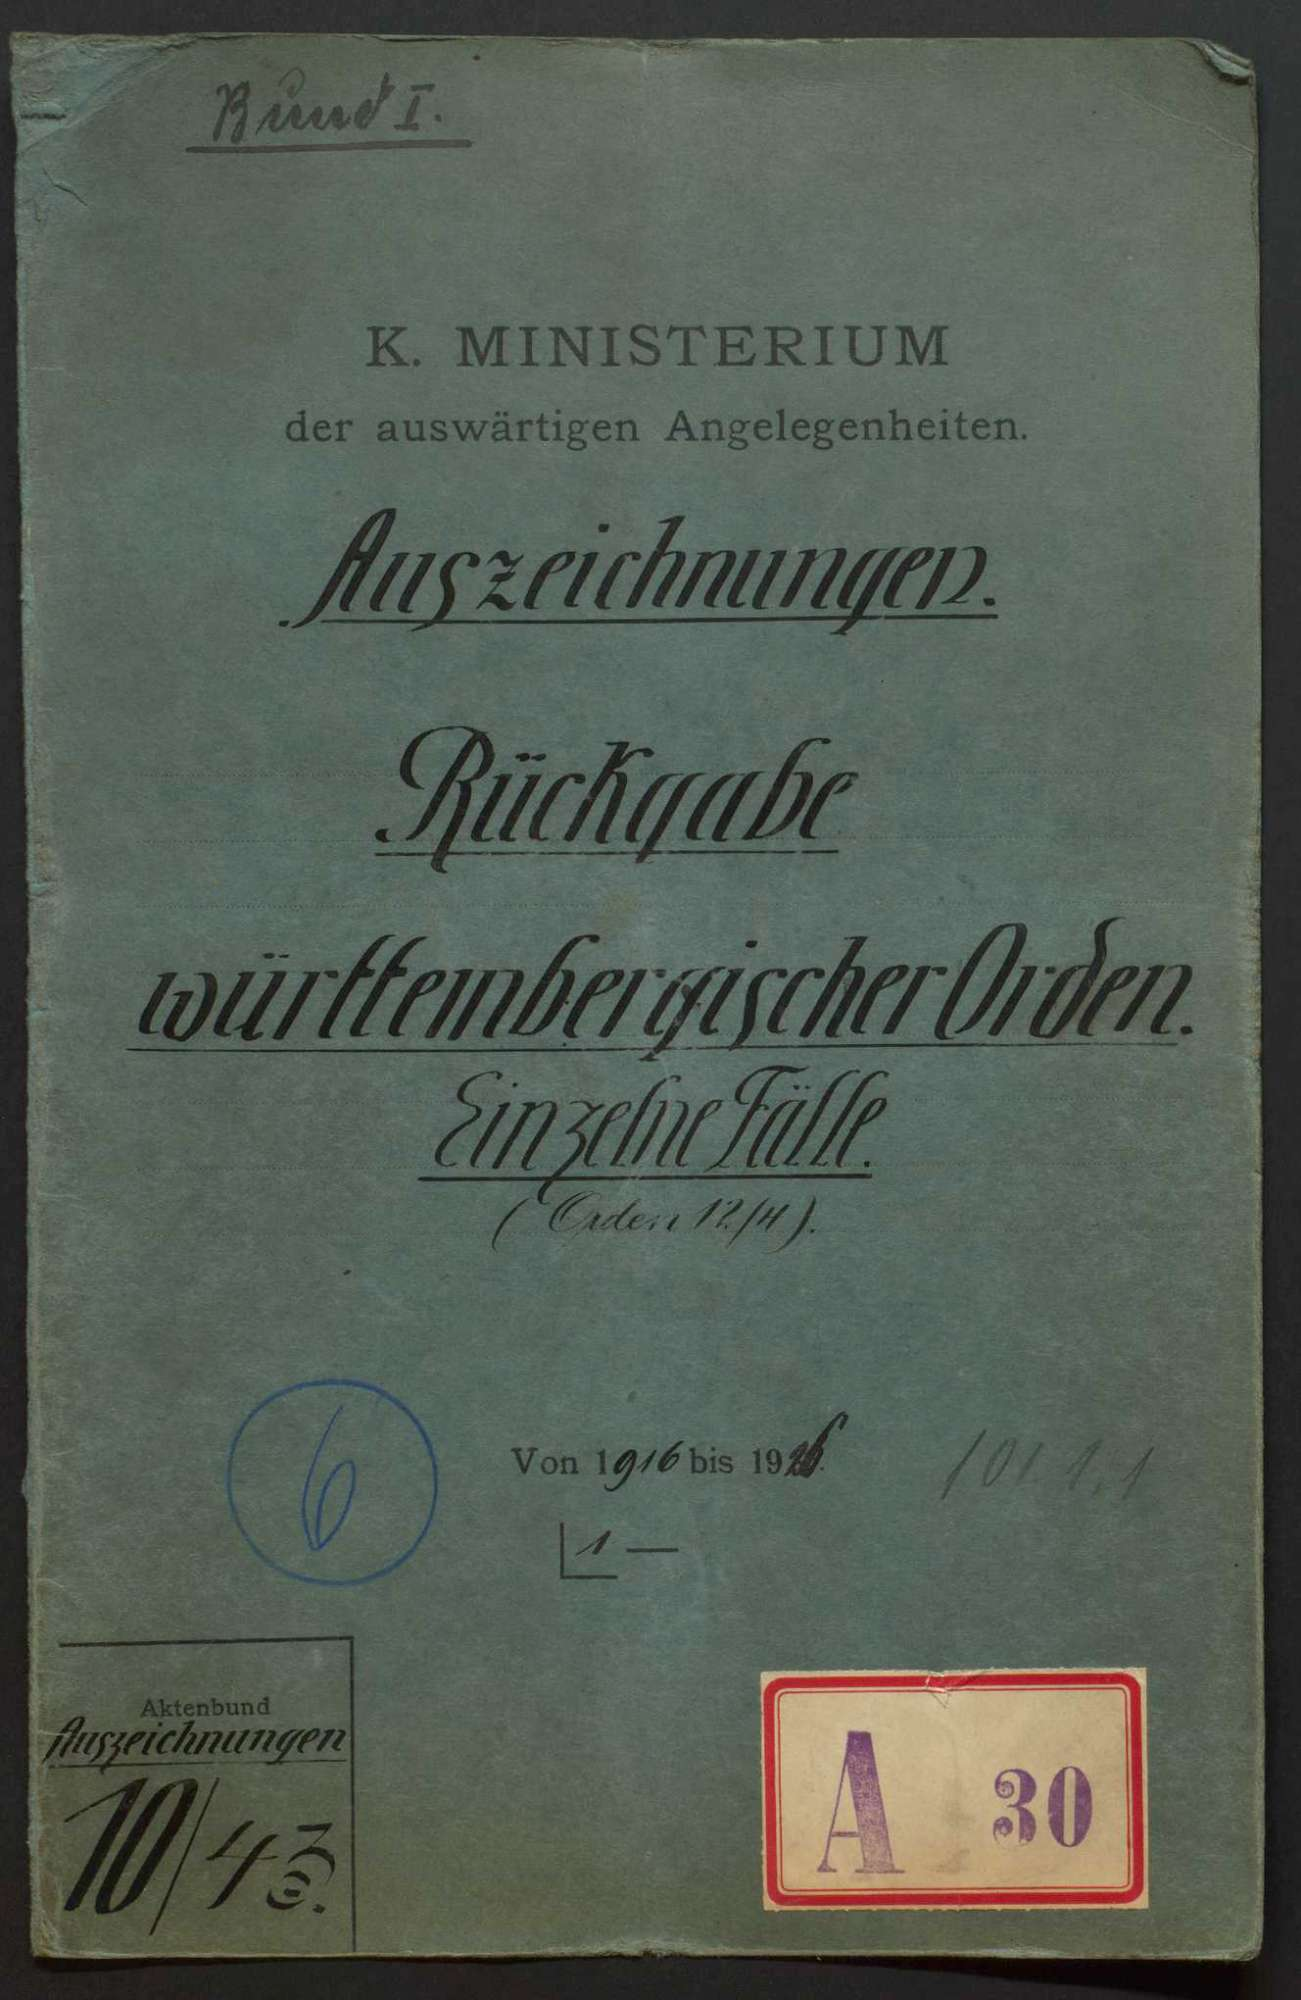 Rückgabe württembergischer Orden, Bild 1